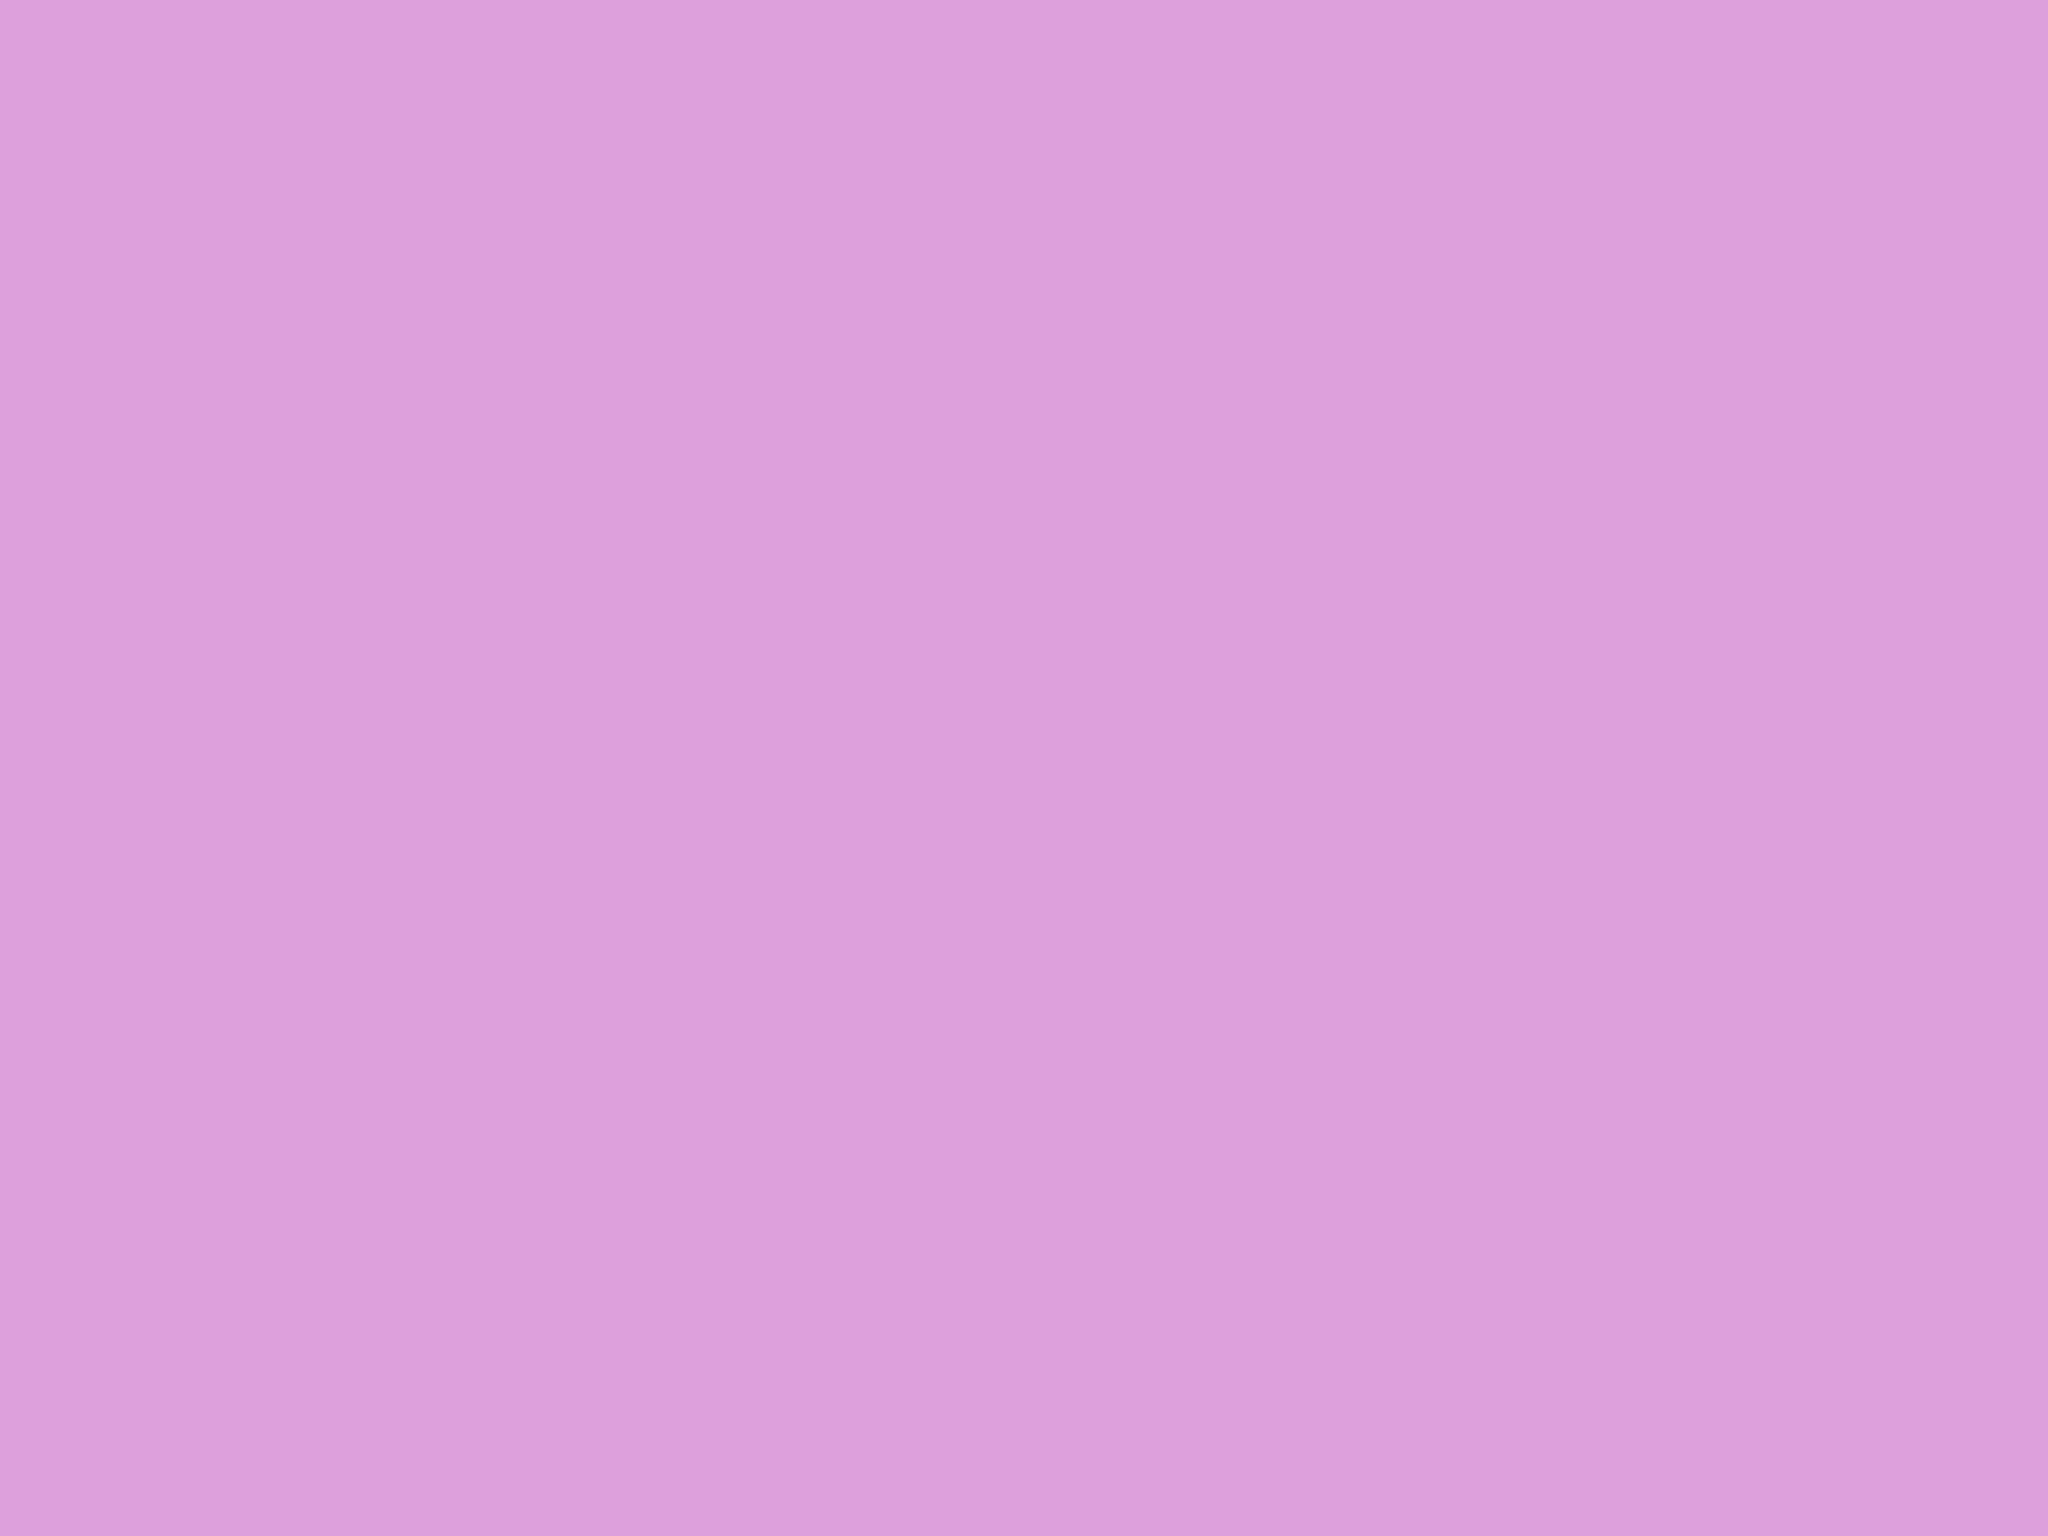 2048x1536 Plum Web Solid Color Background